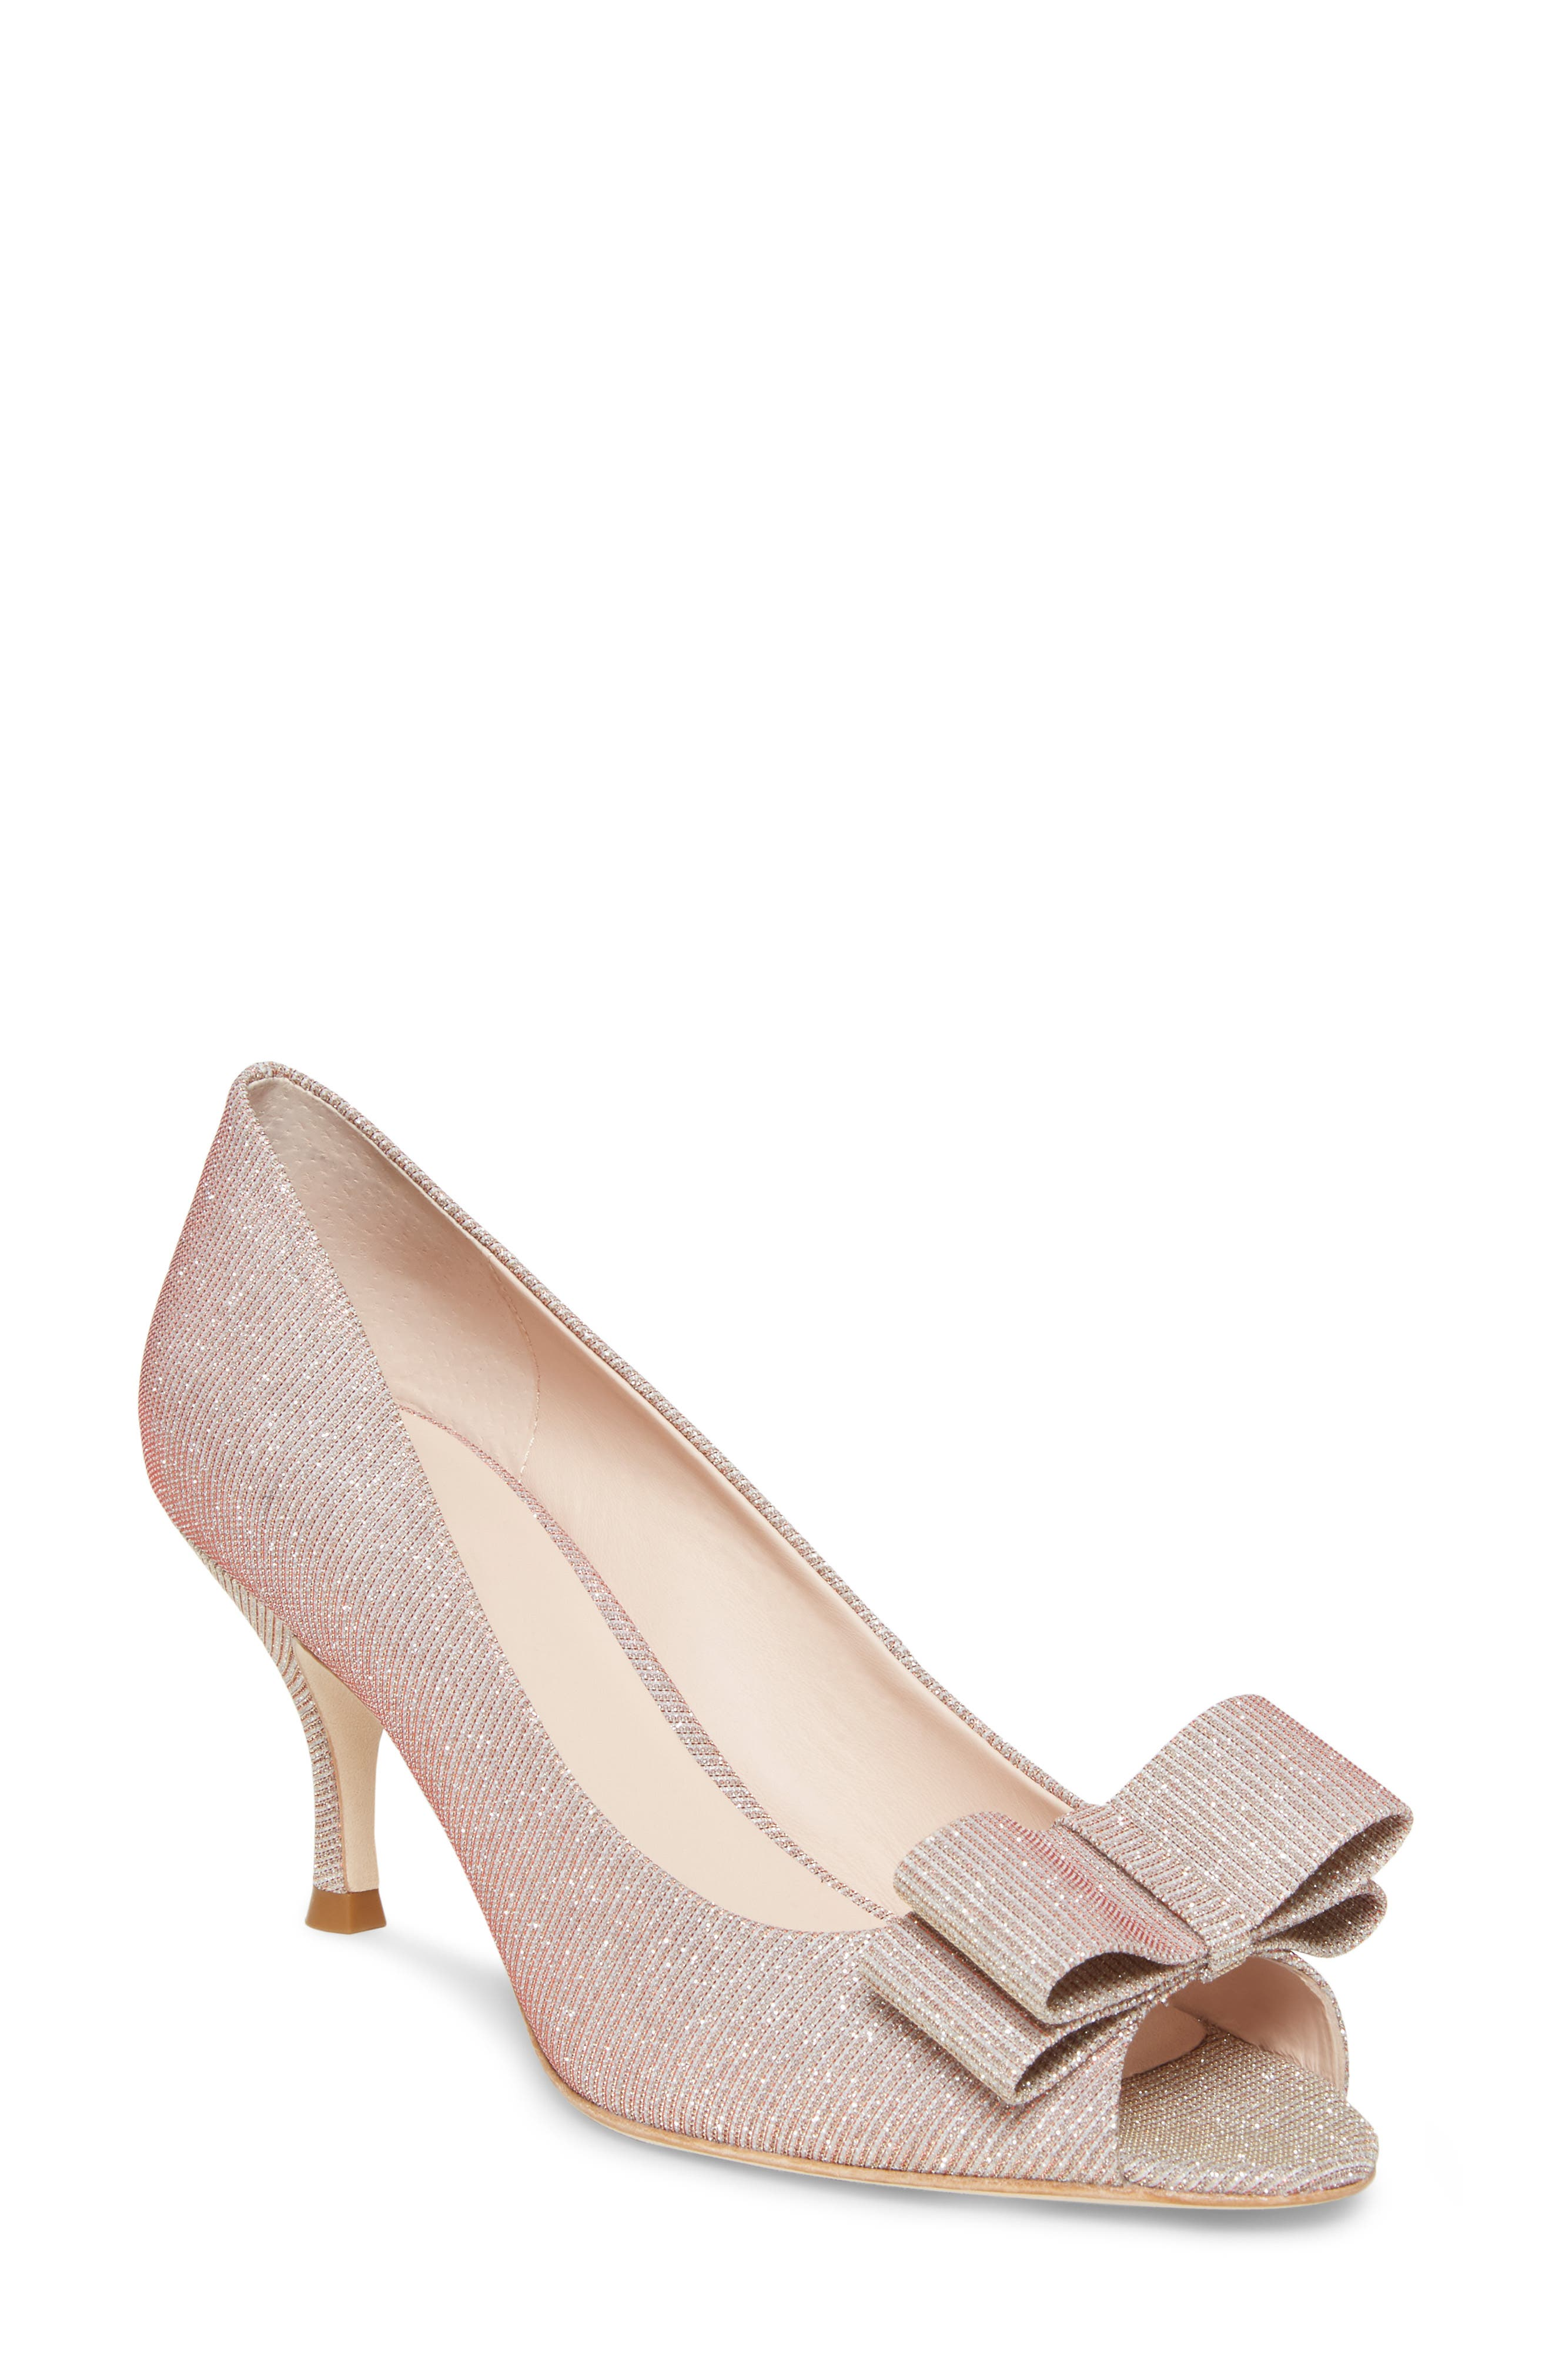 Kate Spade New York Cecelia Peep Toe Pump, Pink